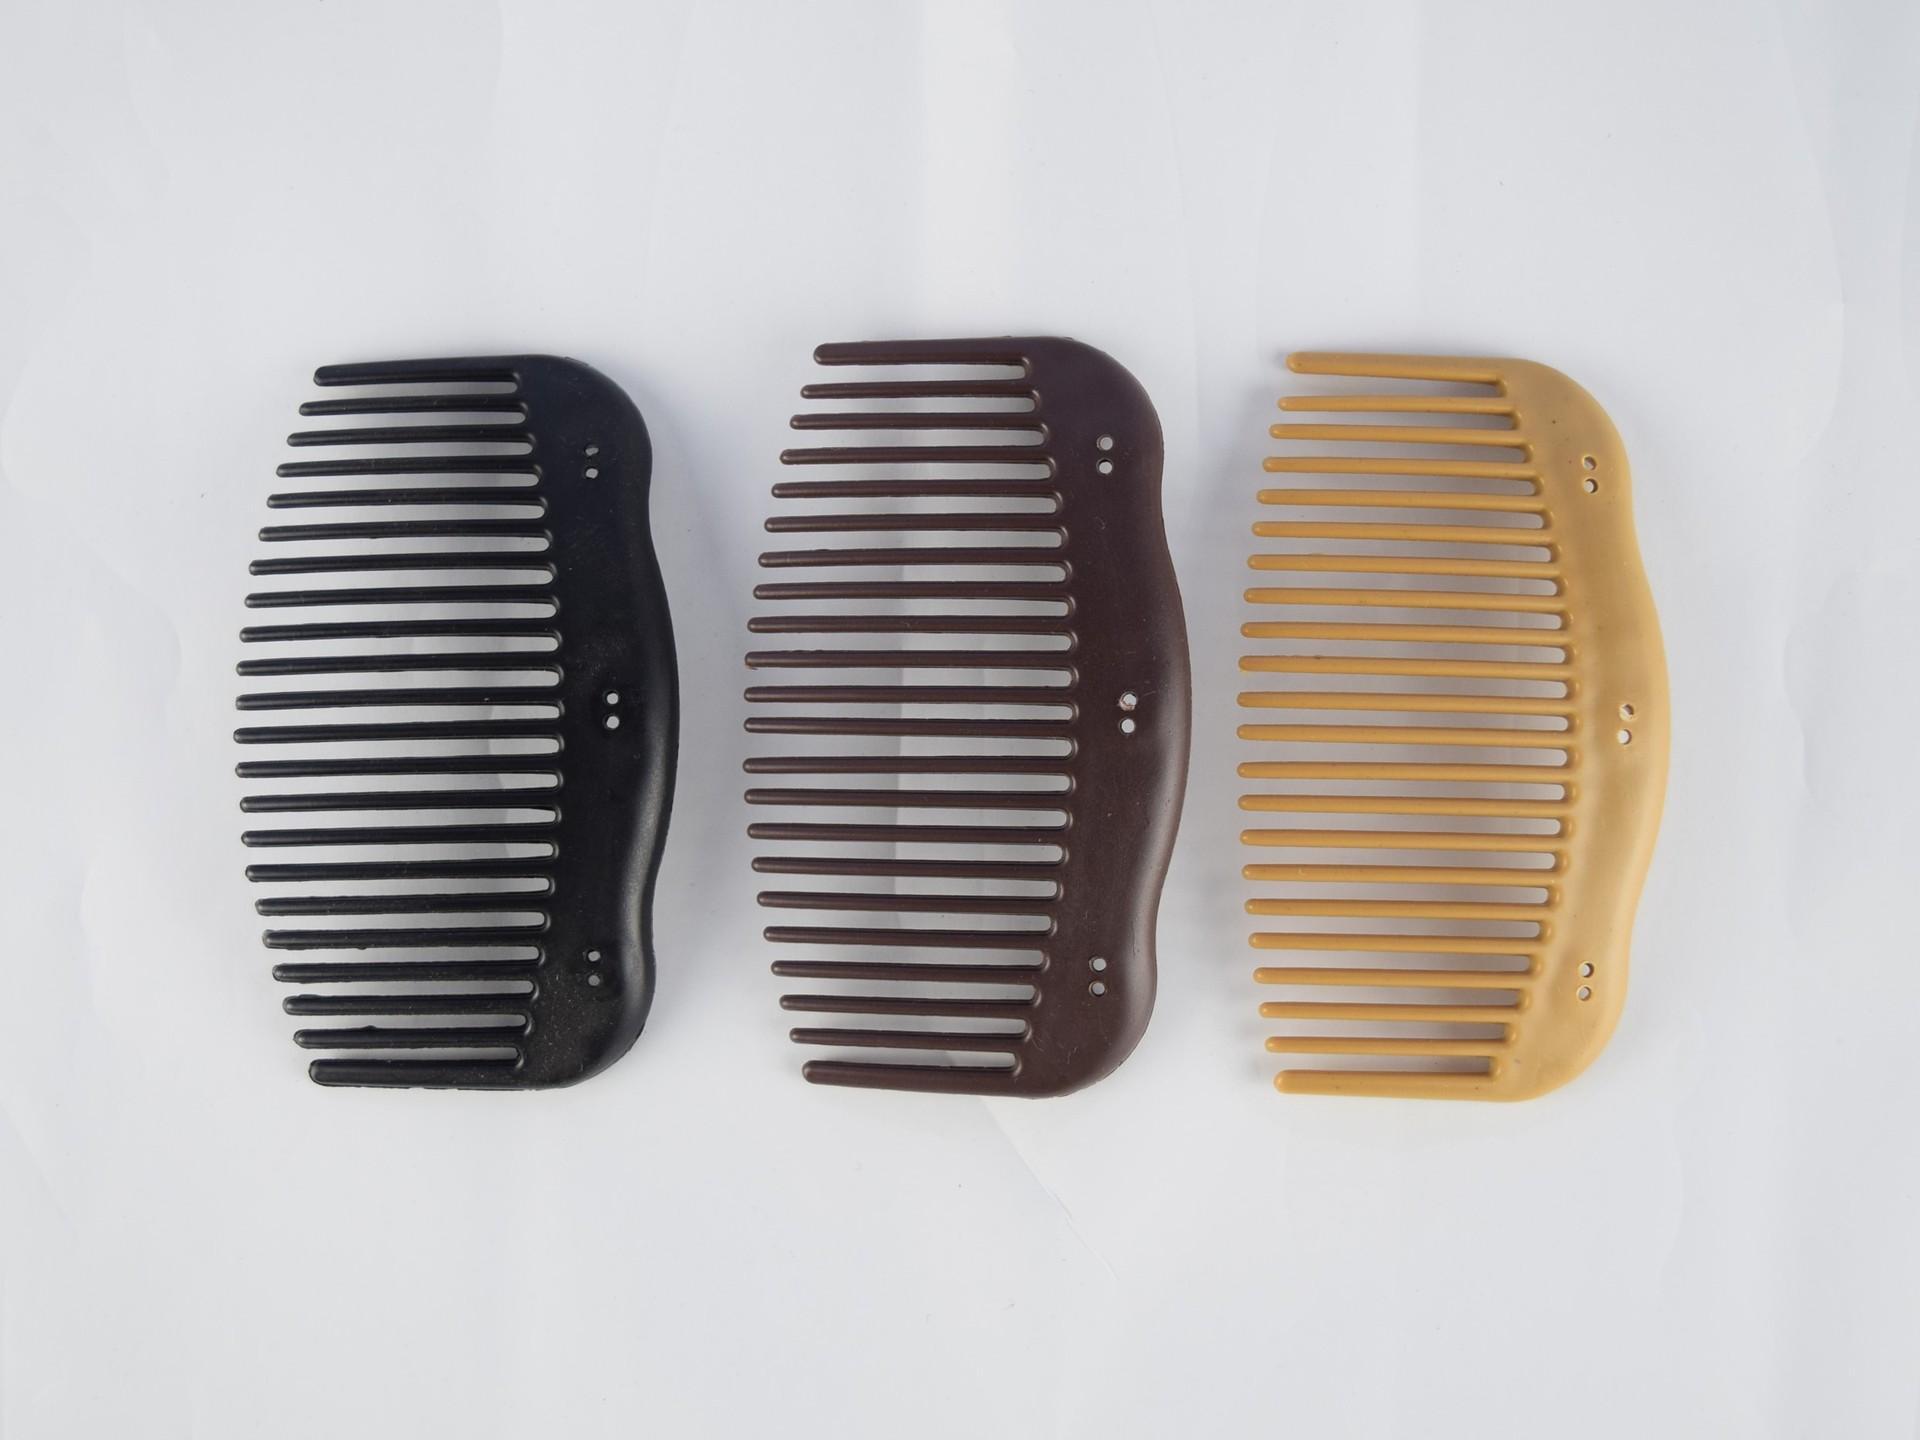 Neue DIY Magic Kämme Damen Holz Stil Kunststoff Multifunktionale Haarkämme Geometrie Kopfbedeckung Haarschmuck Größe M L100PCS pro Los